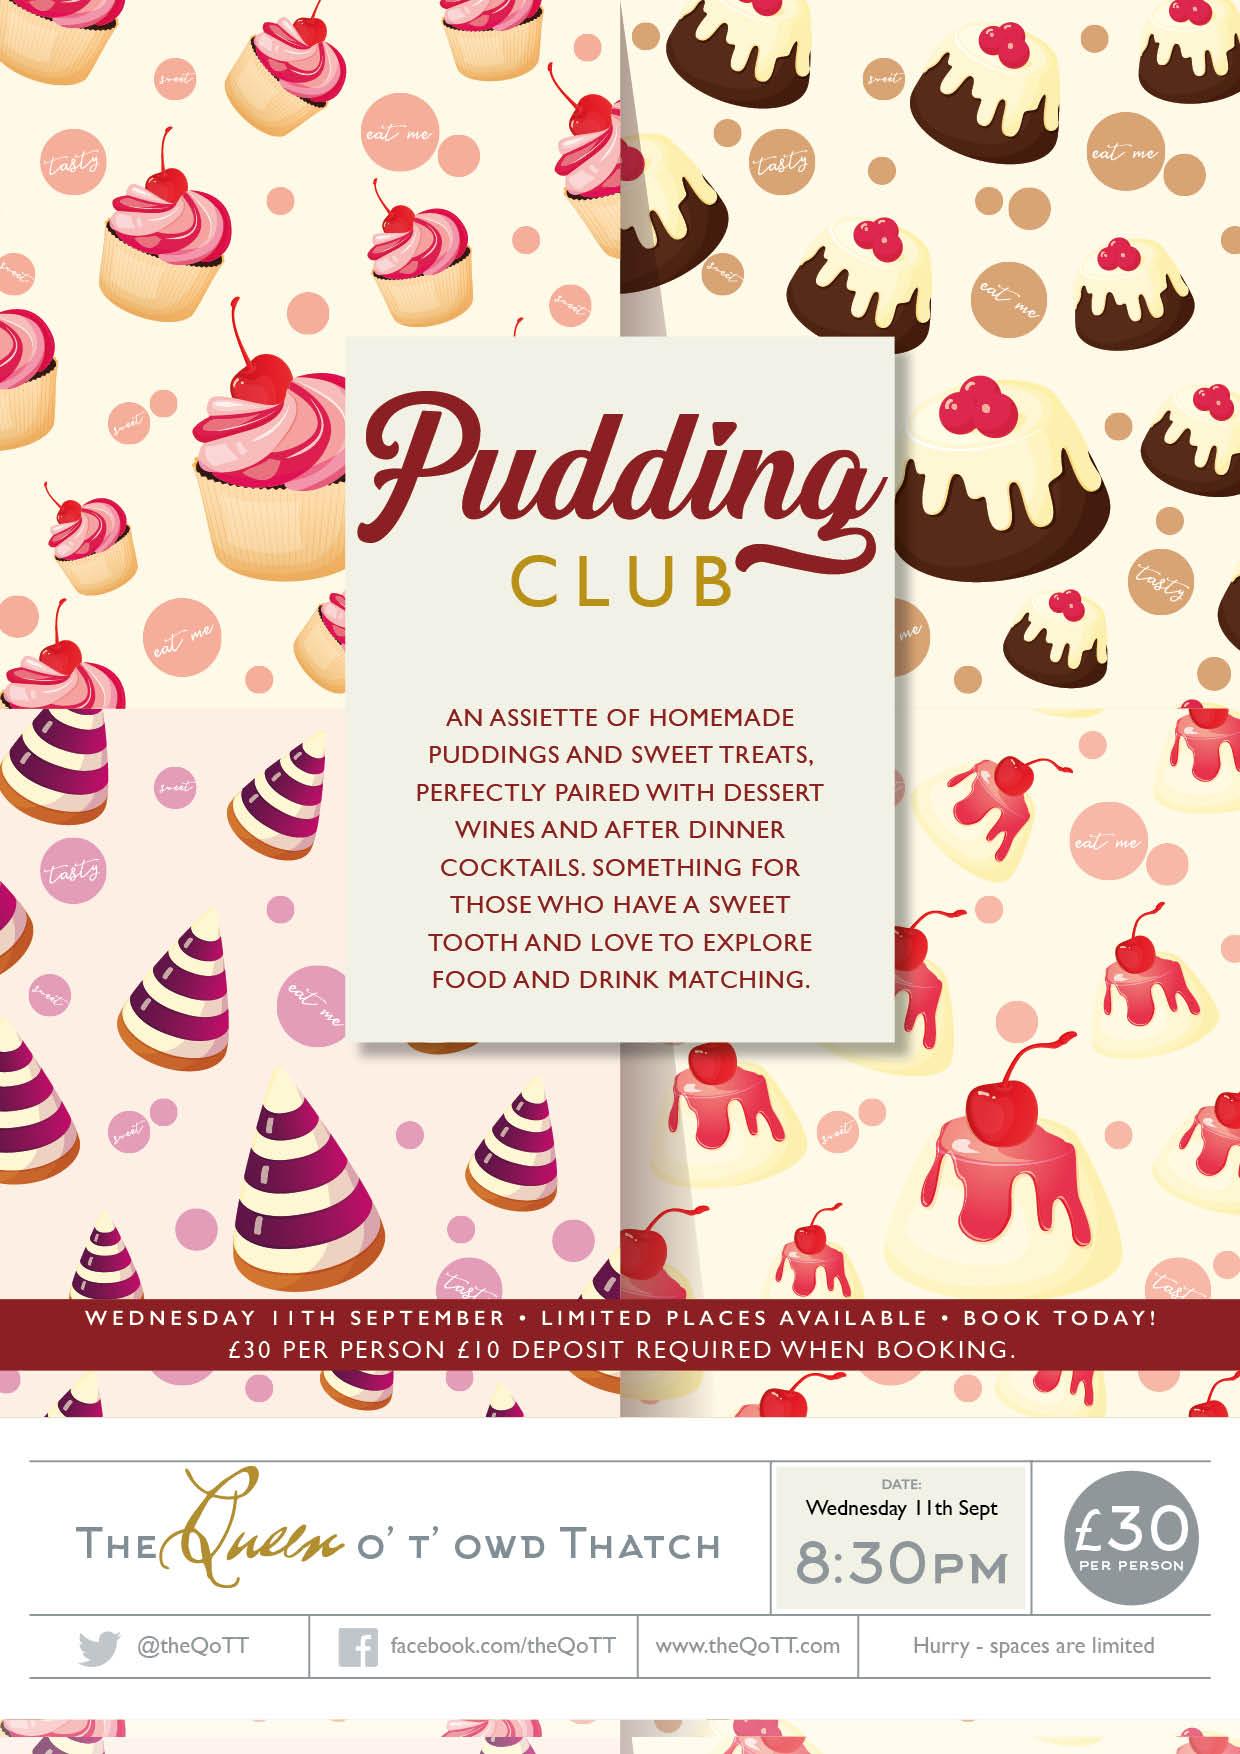 pudding_club_11th_september.jpg